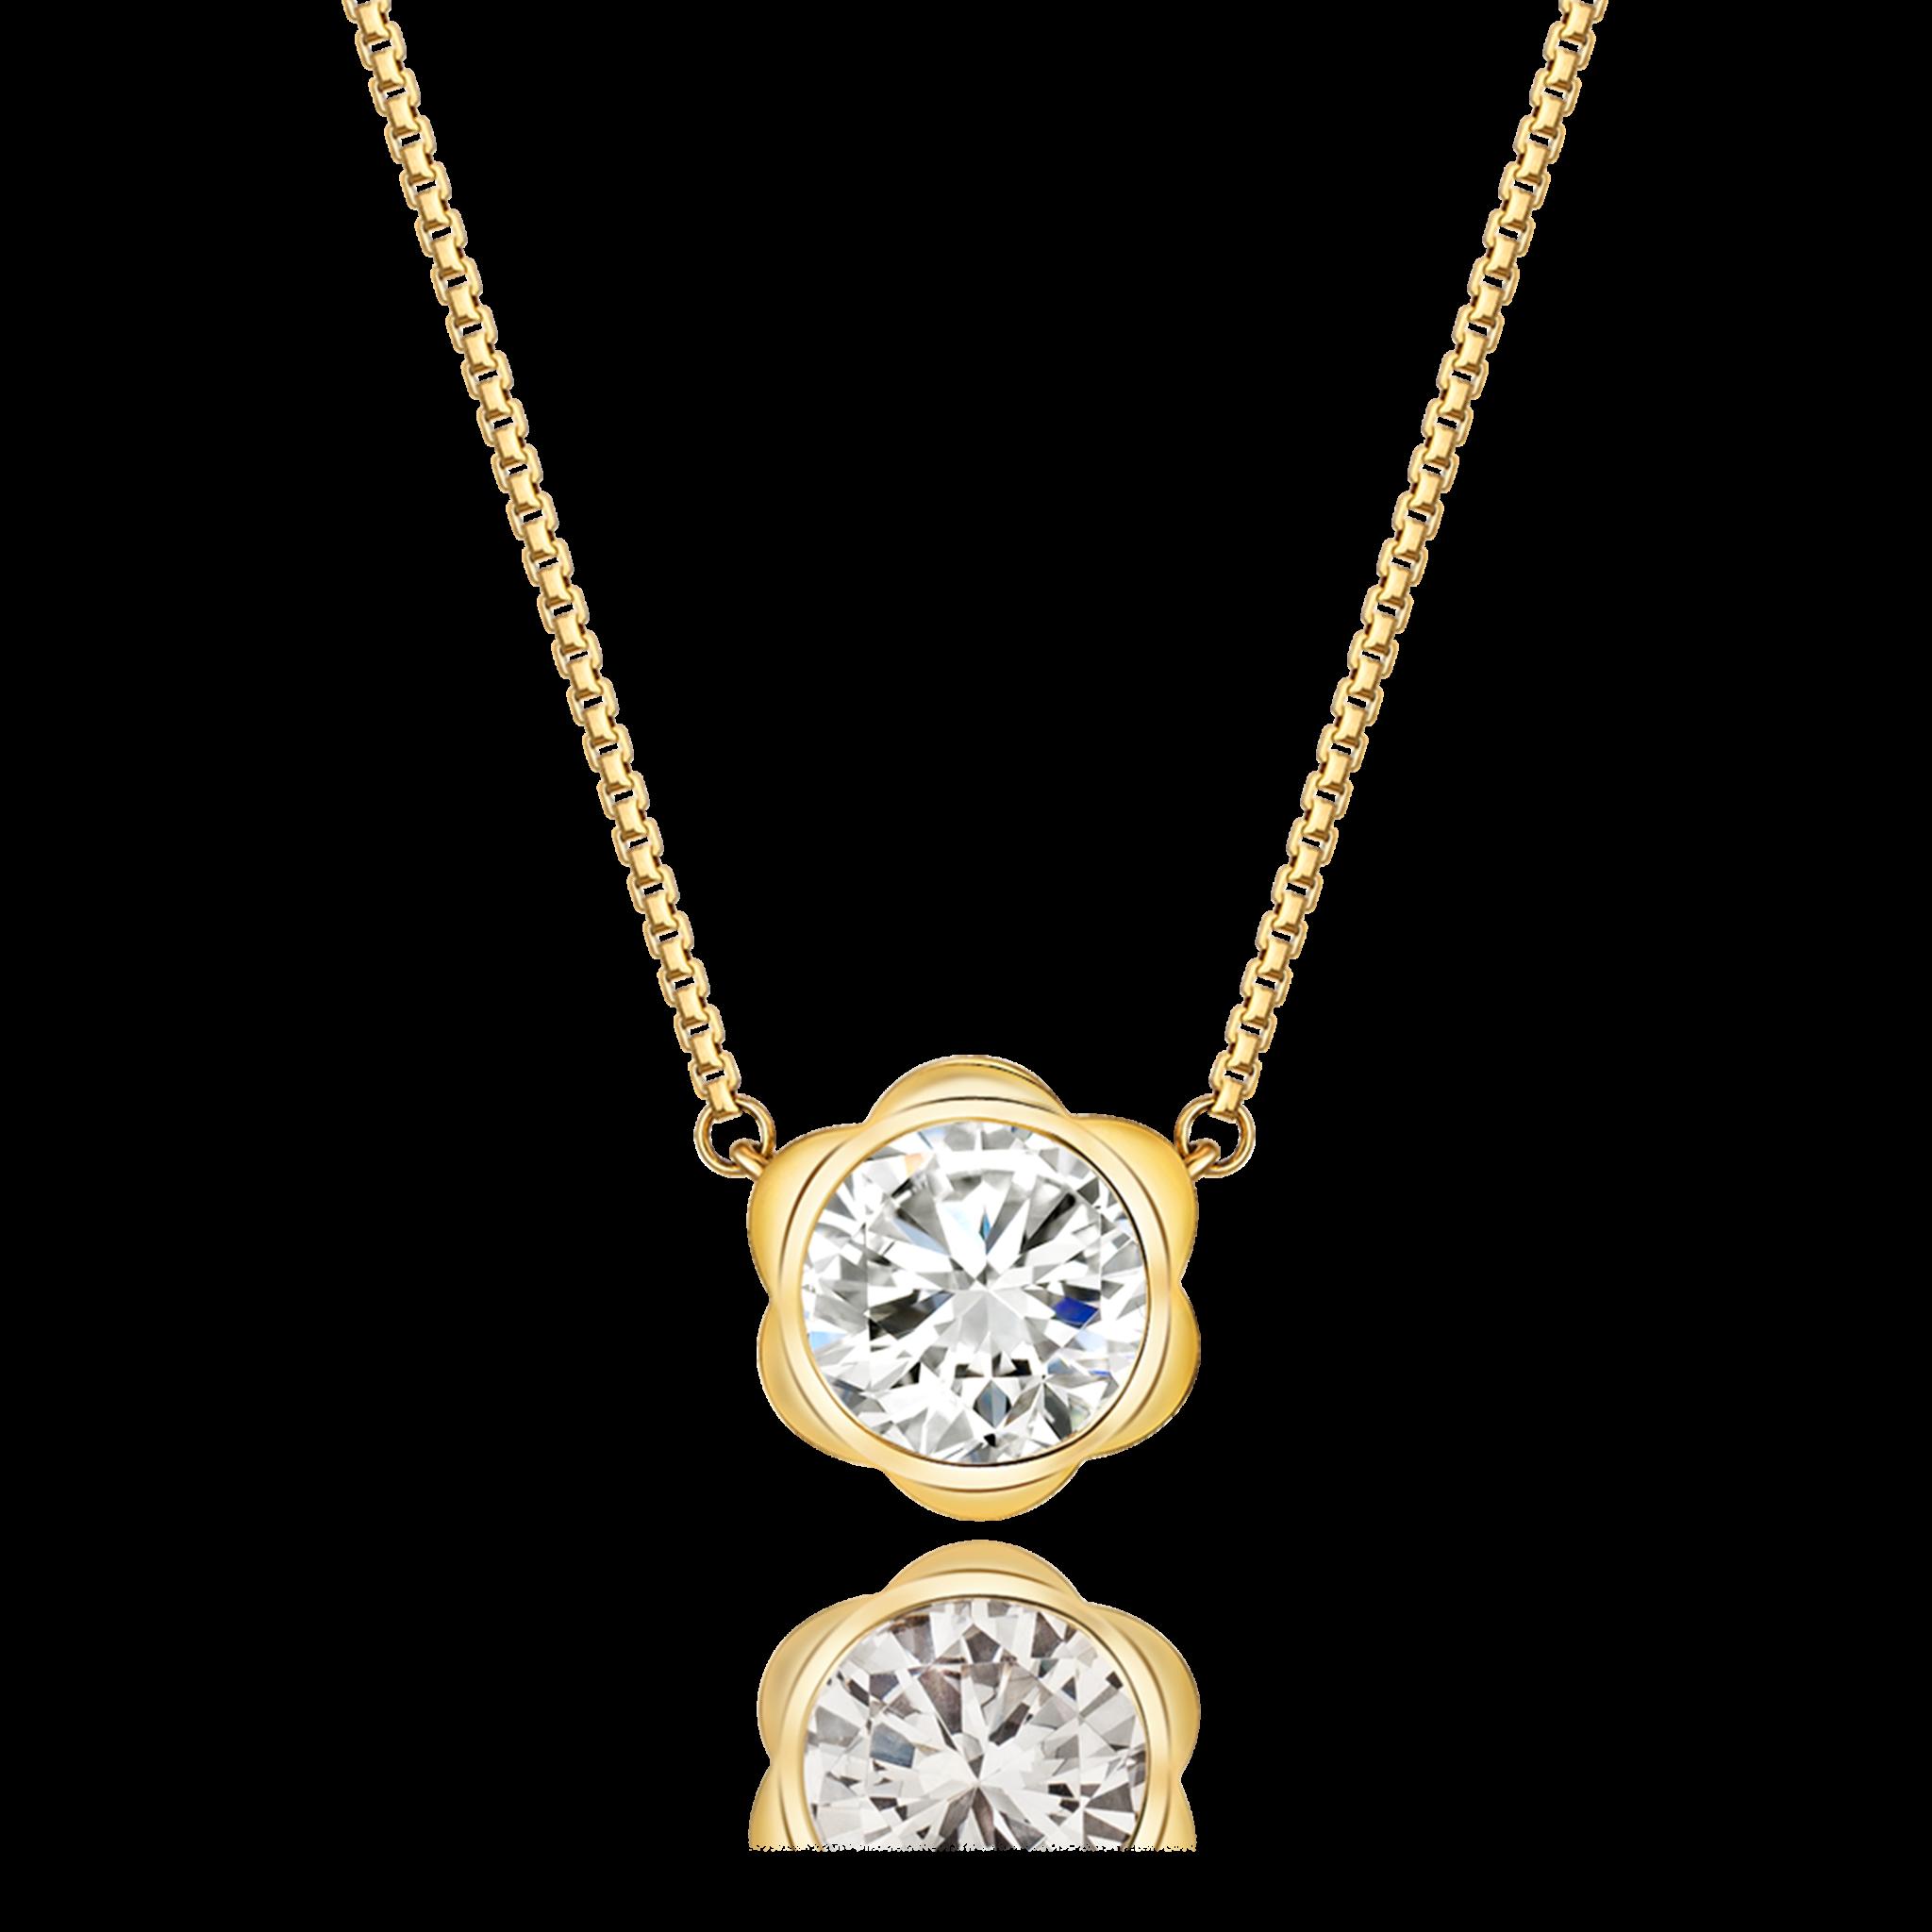 Magnolia Collection 18K黄金 单钻项链2 (10分钻- ¥3699 : 20分钻- ¥5799 : 30分- ¥8199)